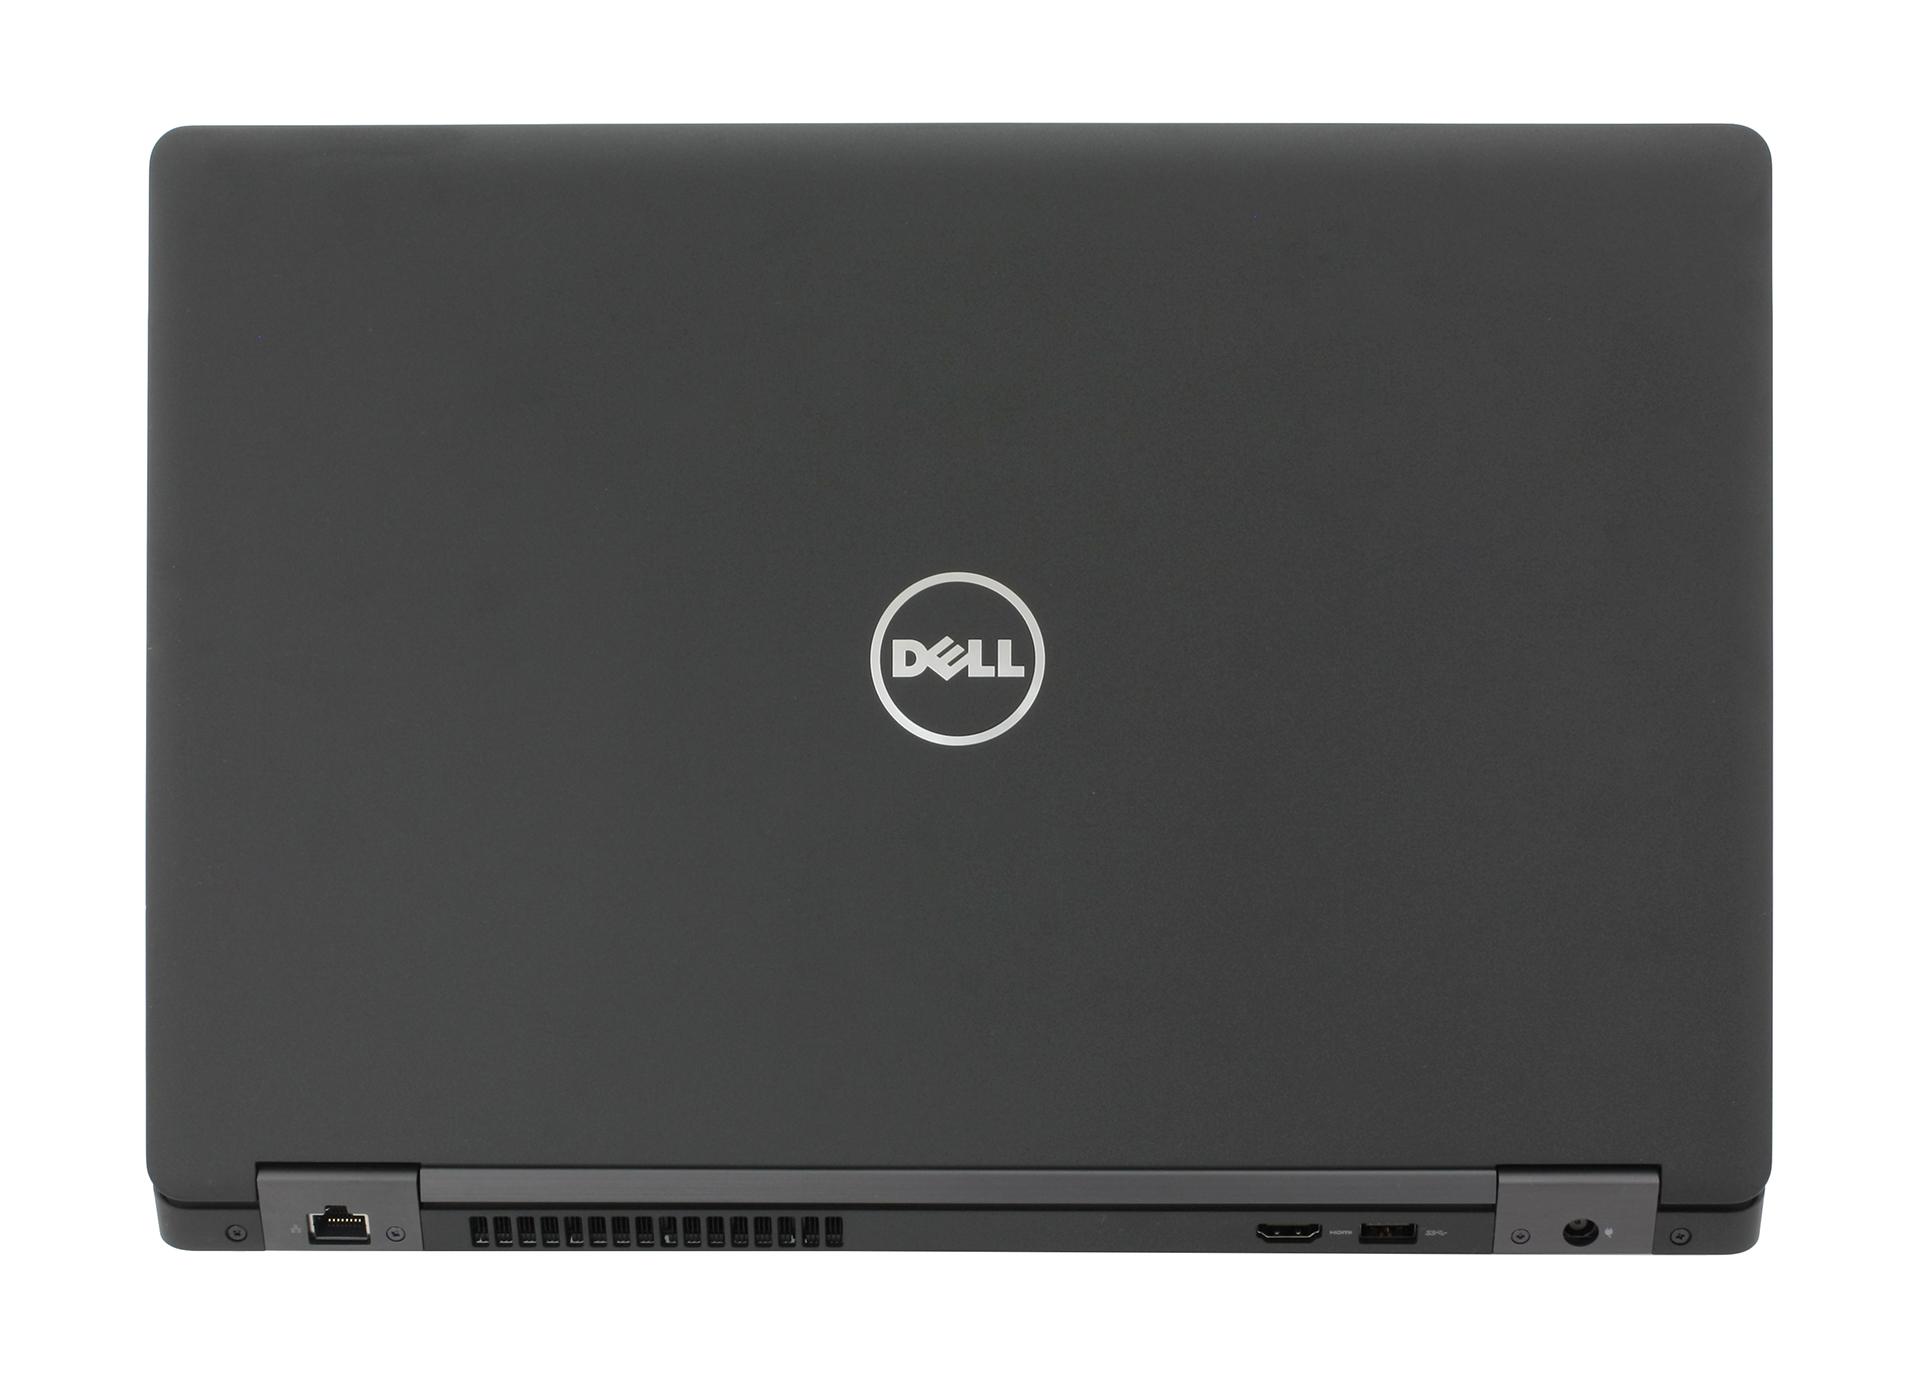 Dell Laptop Battery Light Flashing Orange And White